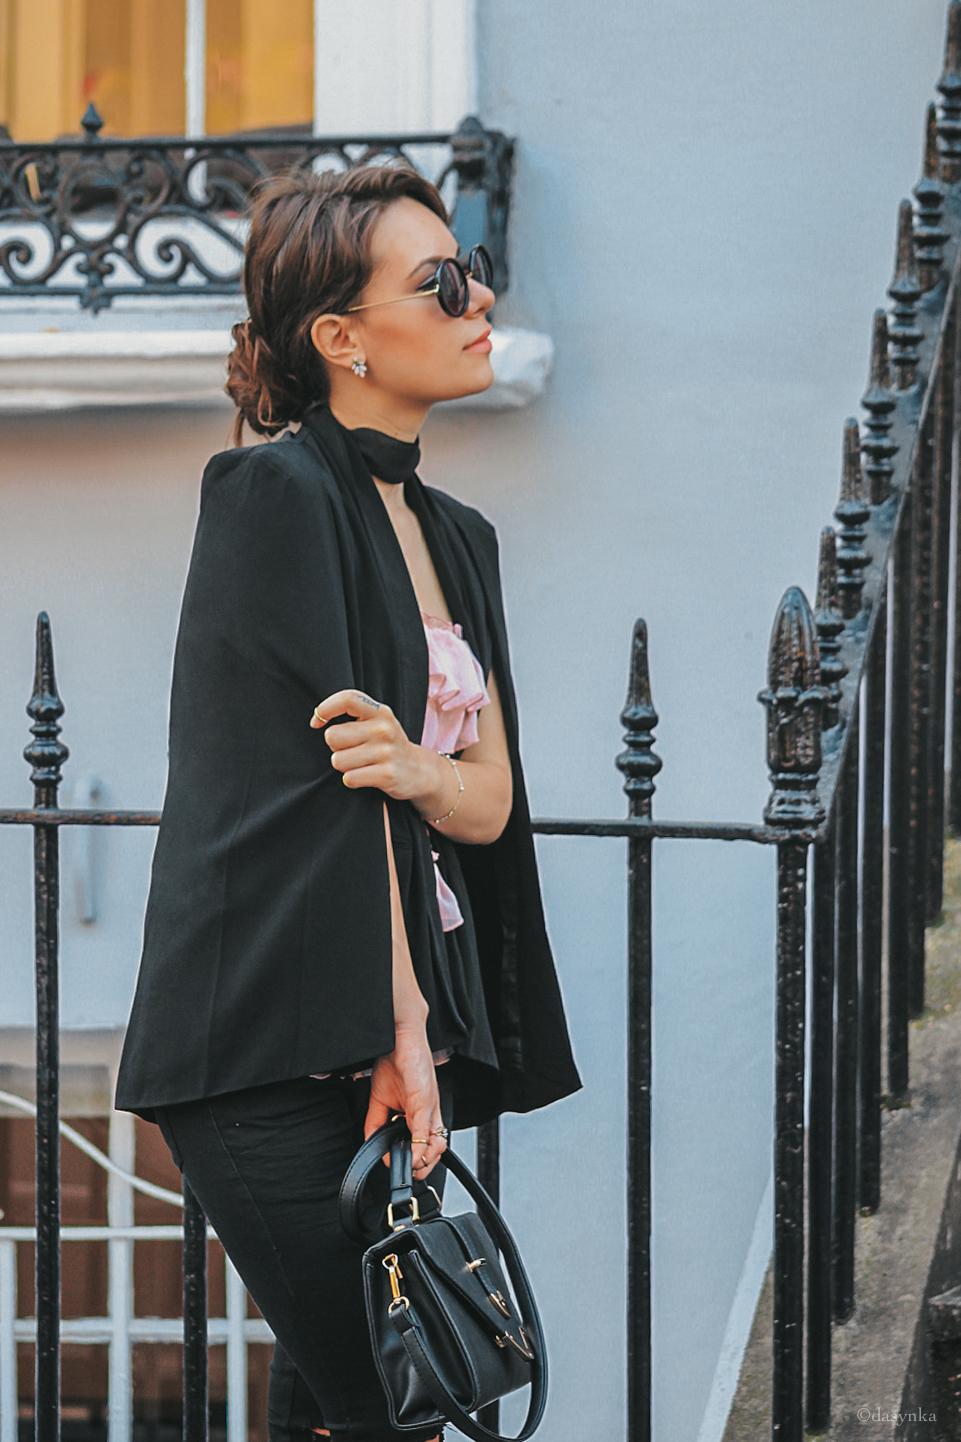 dasynka-fashion-blogger-notting-hill-london-sunnies-houses-pink-bag-black-choker-colors-pinterest-blazer-pink-top-pants-bag